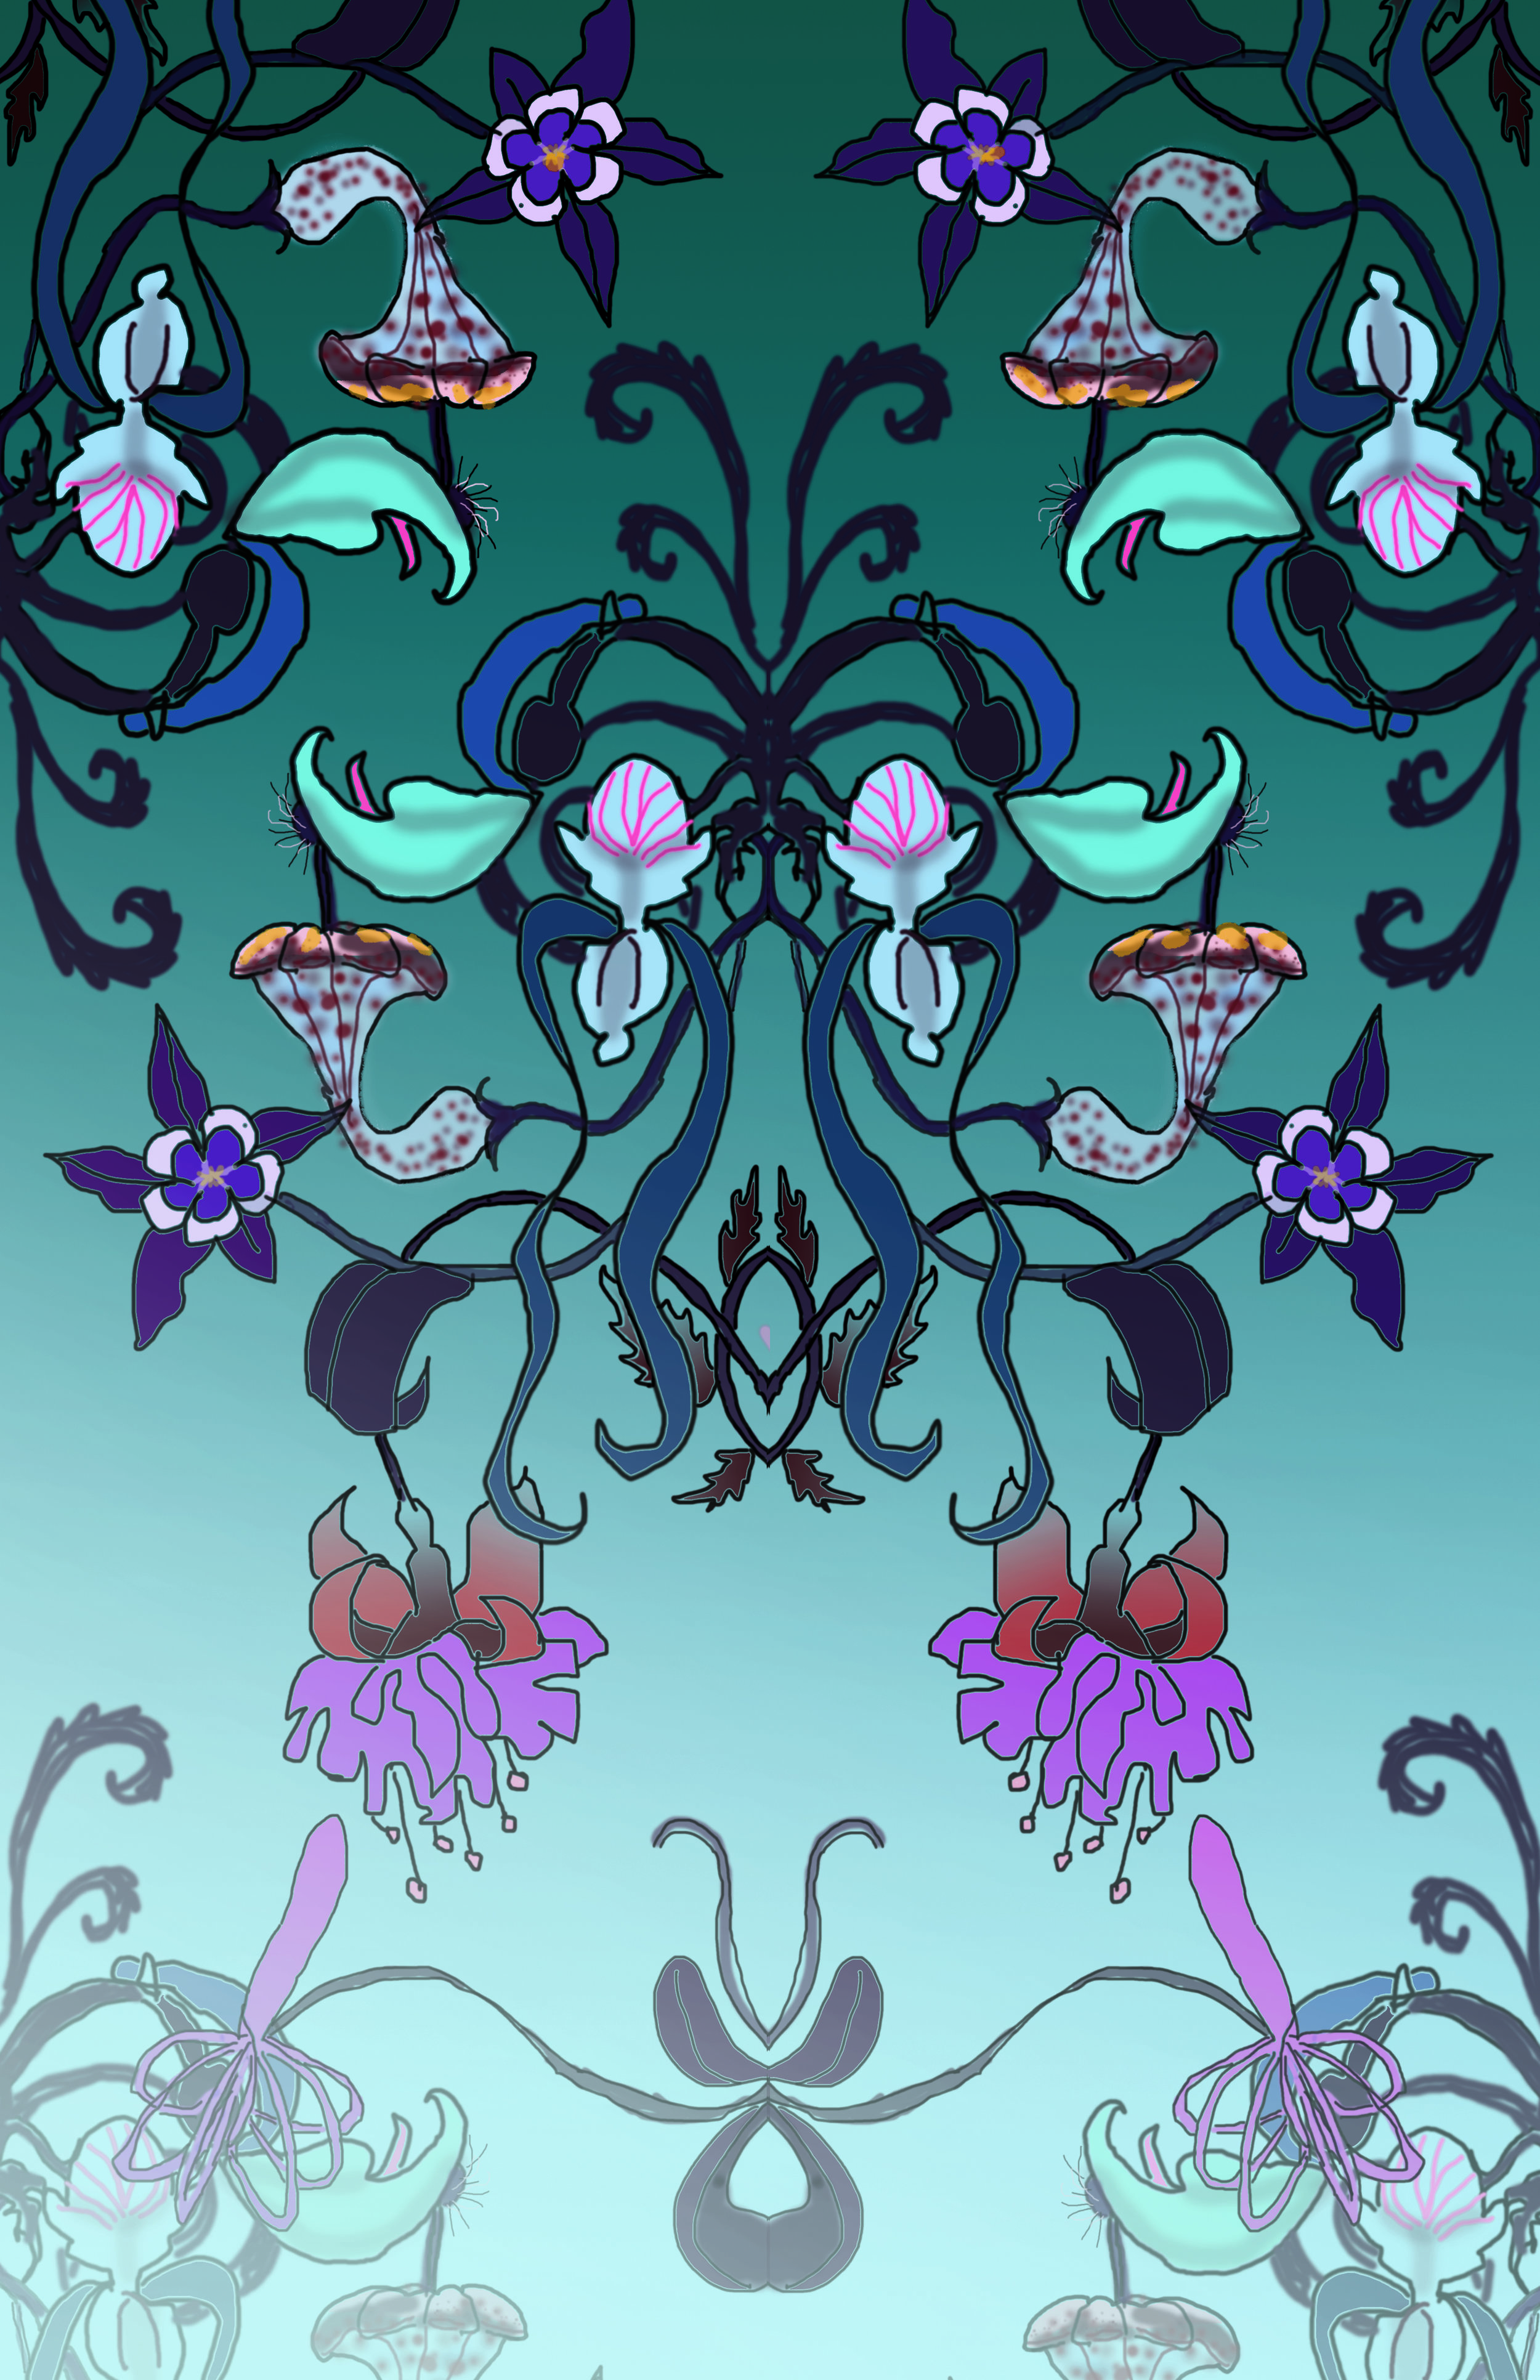 Wallpaper_FLORAL.jpg